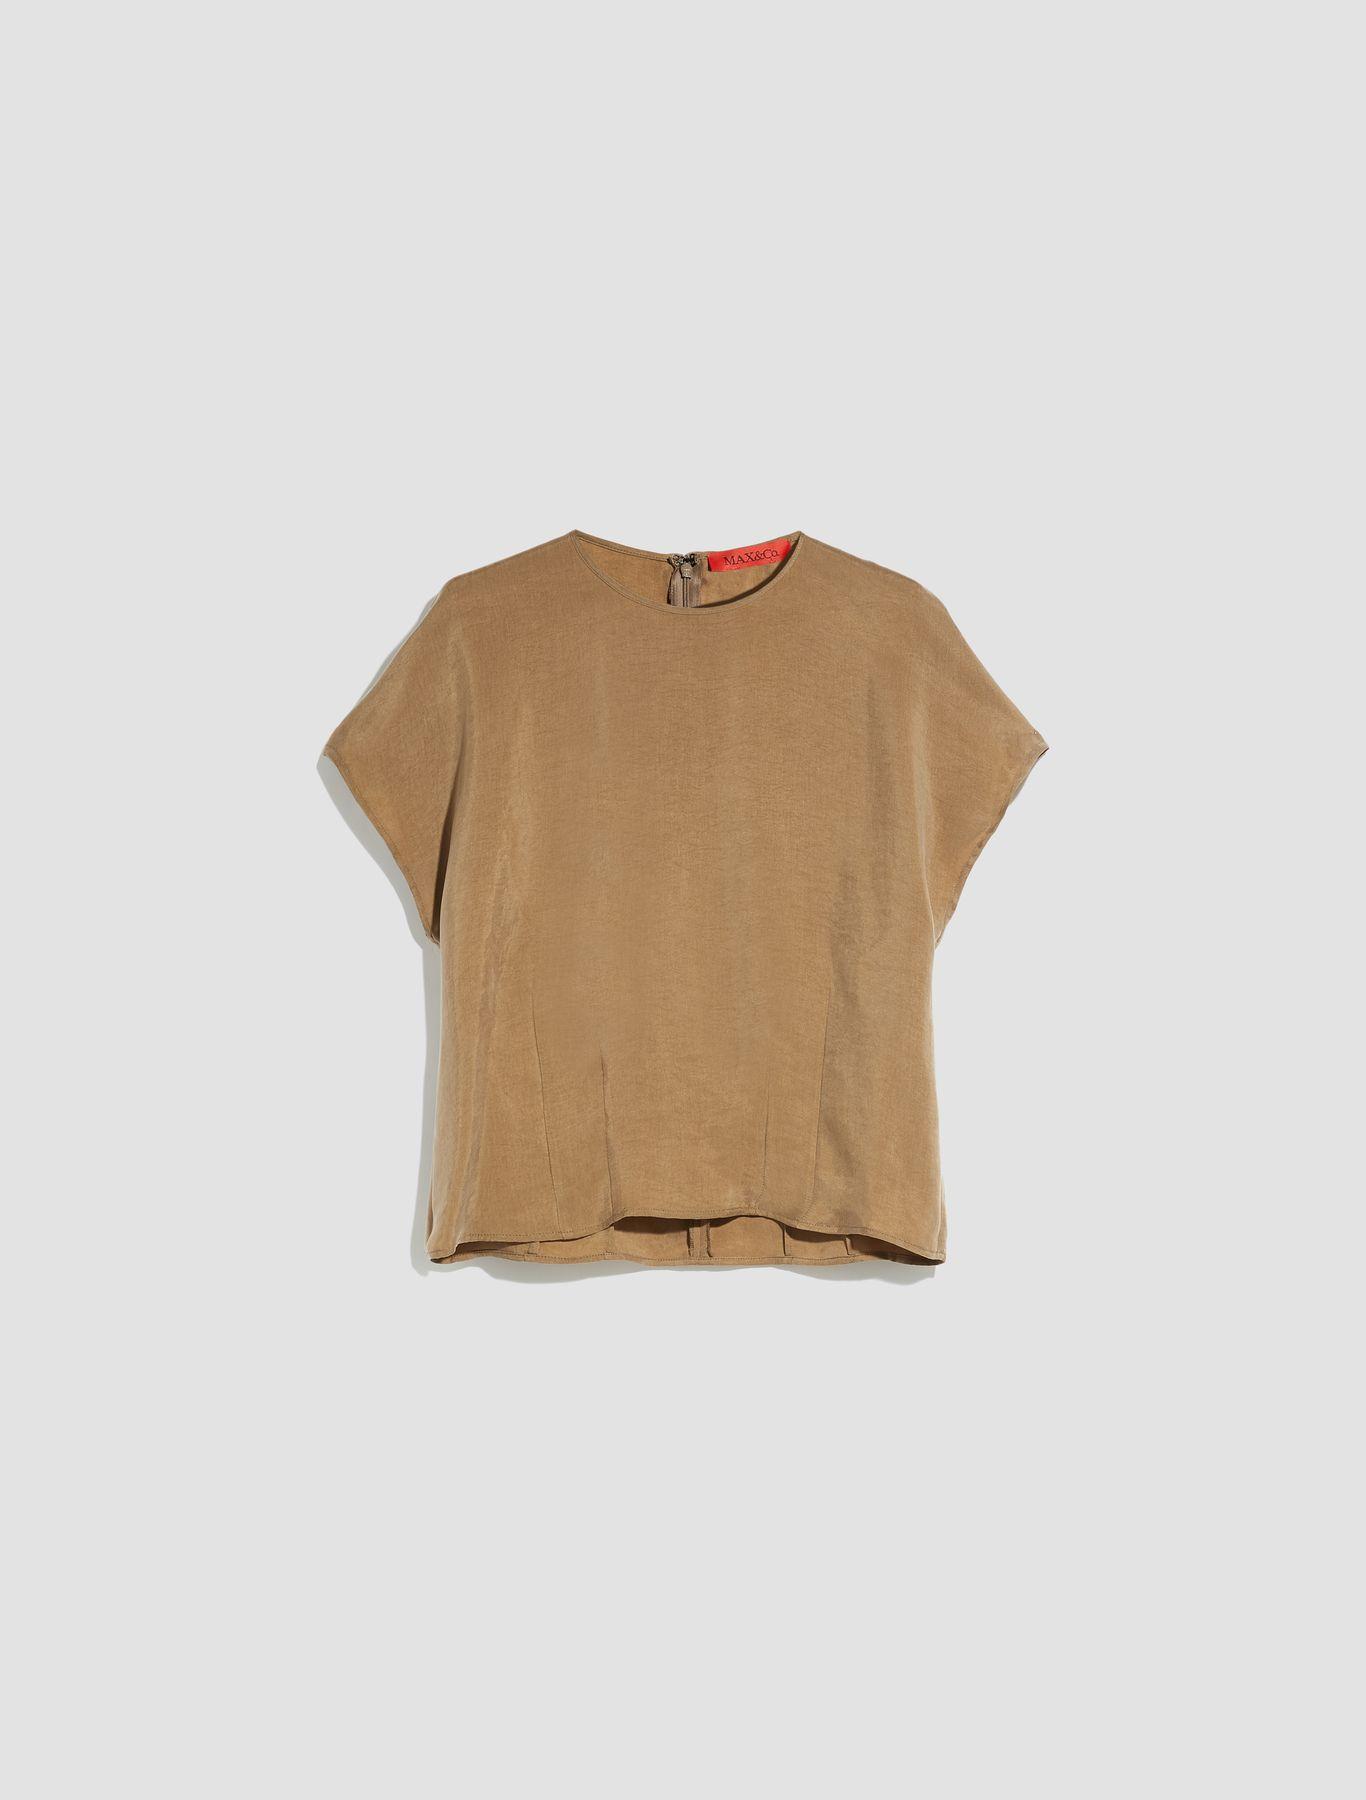 DISPUTA Shirt brown 5